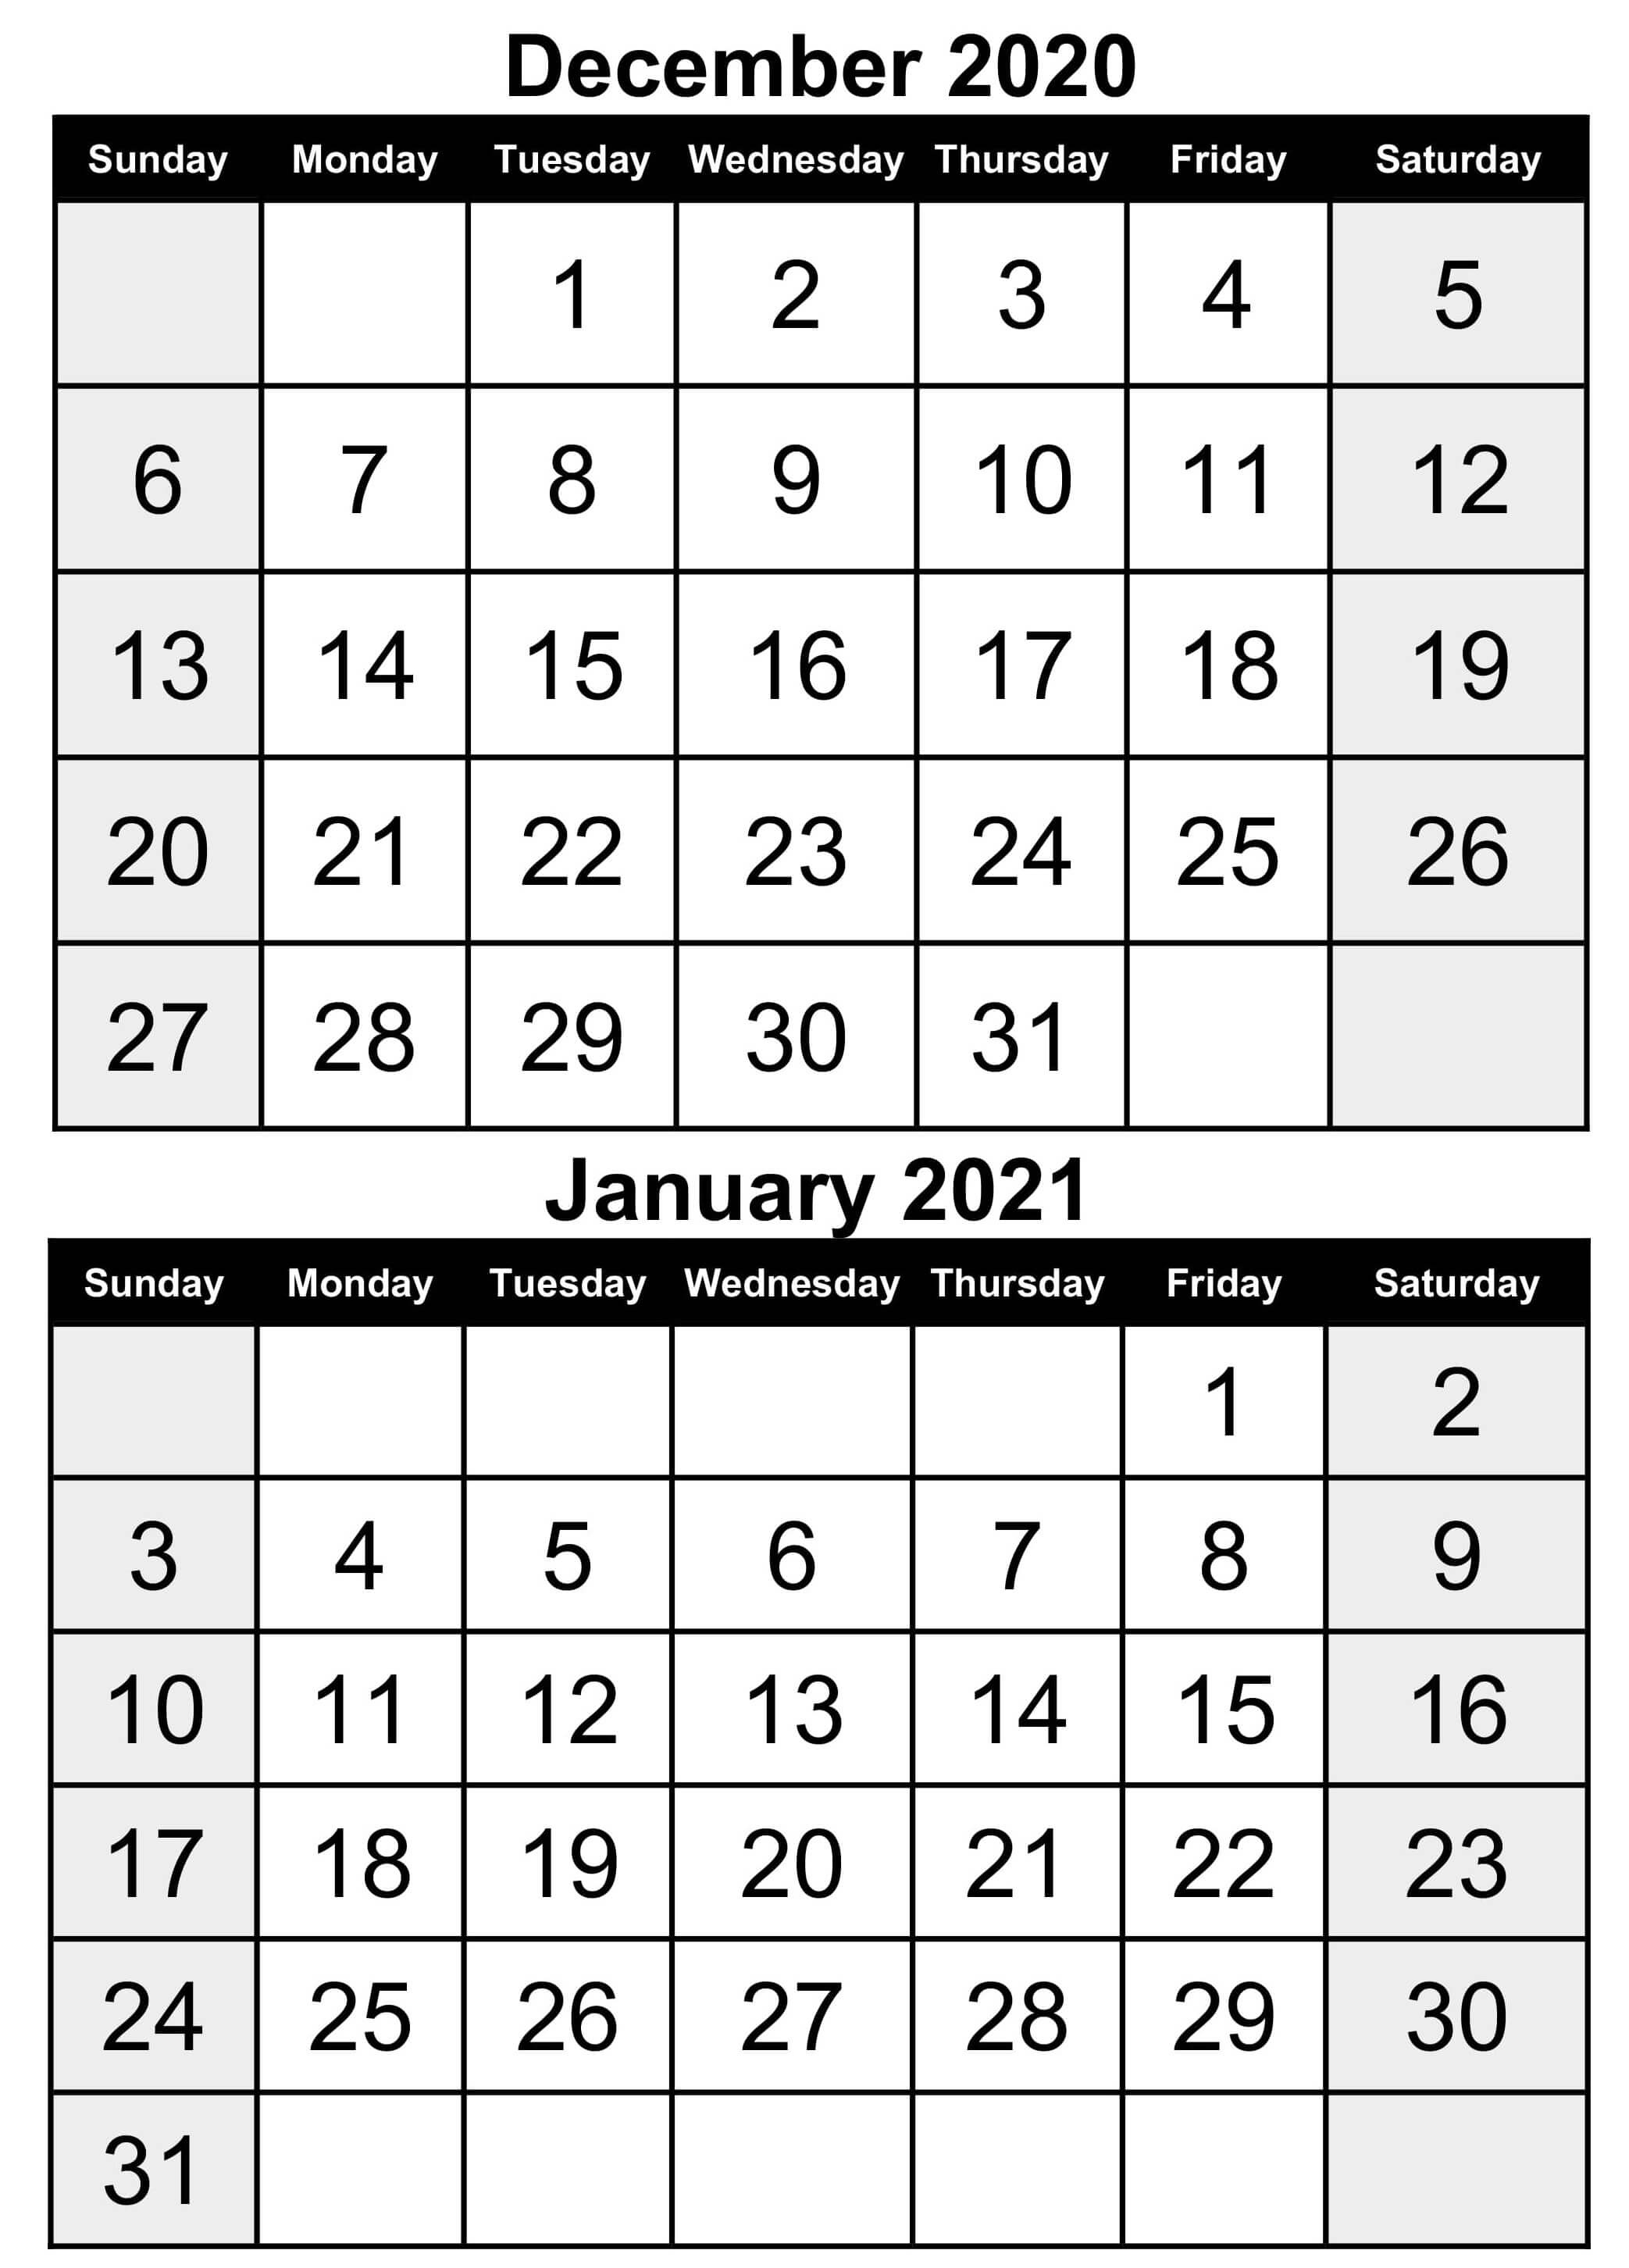 December 2020 January 2021 Calendar Word | Free Printable Calendar Shop December 2020 January 2021 Calendar Printable